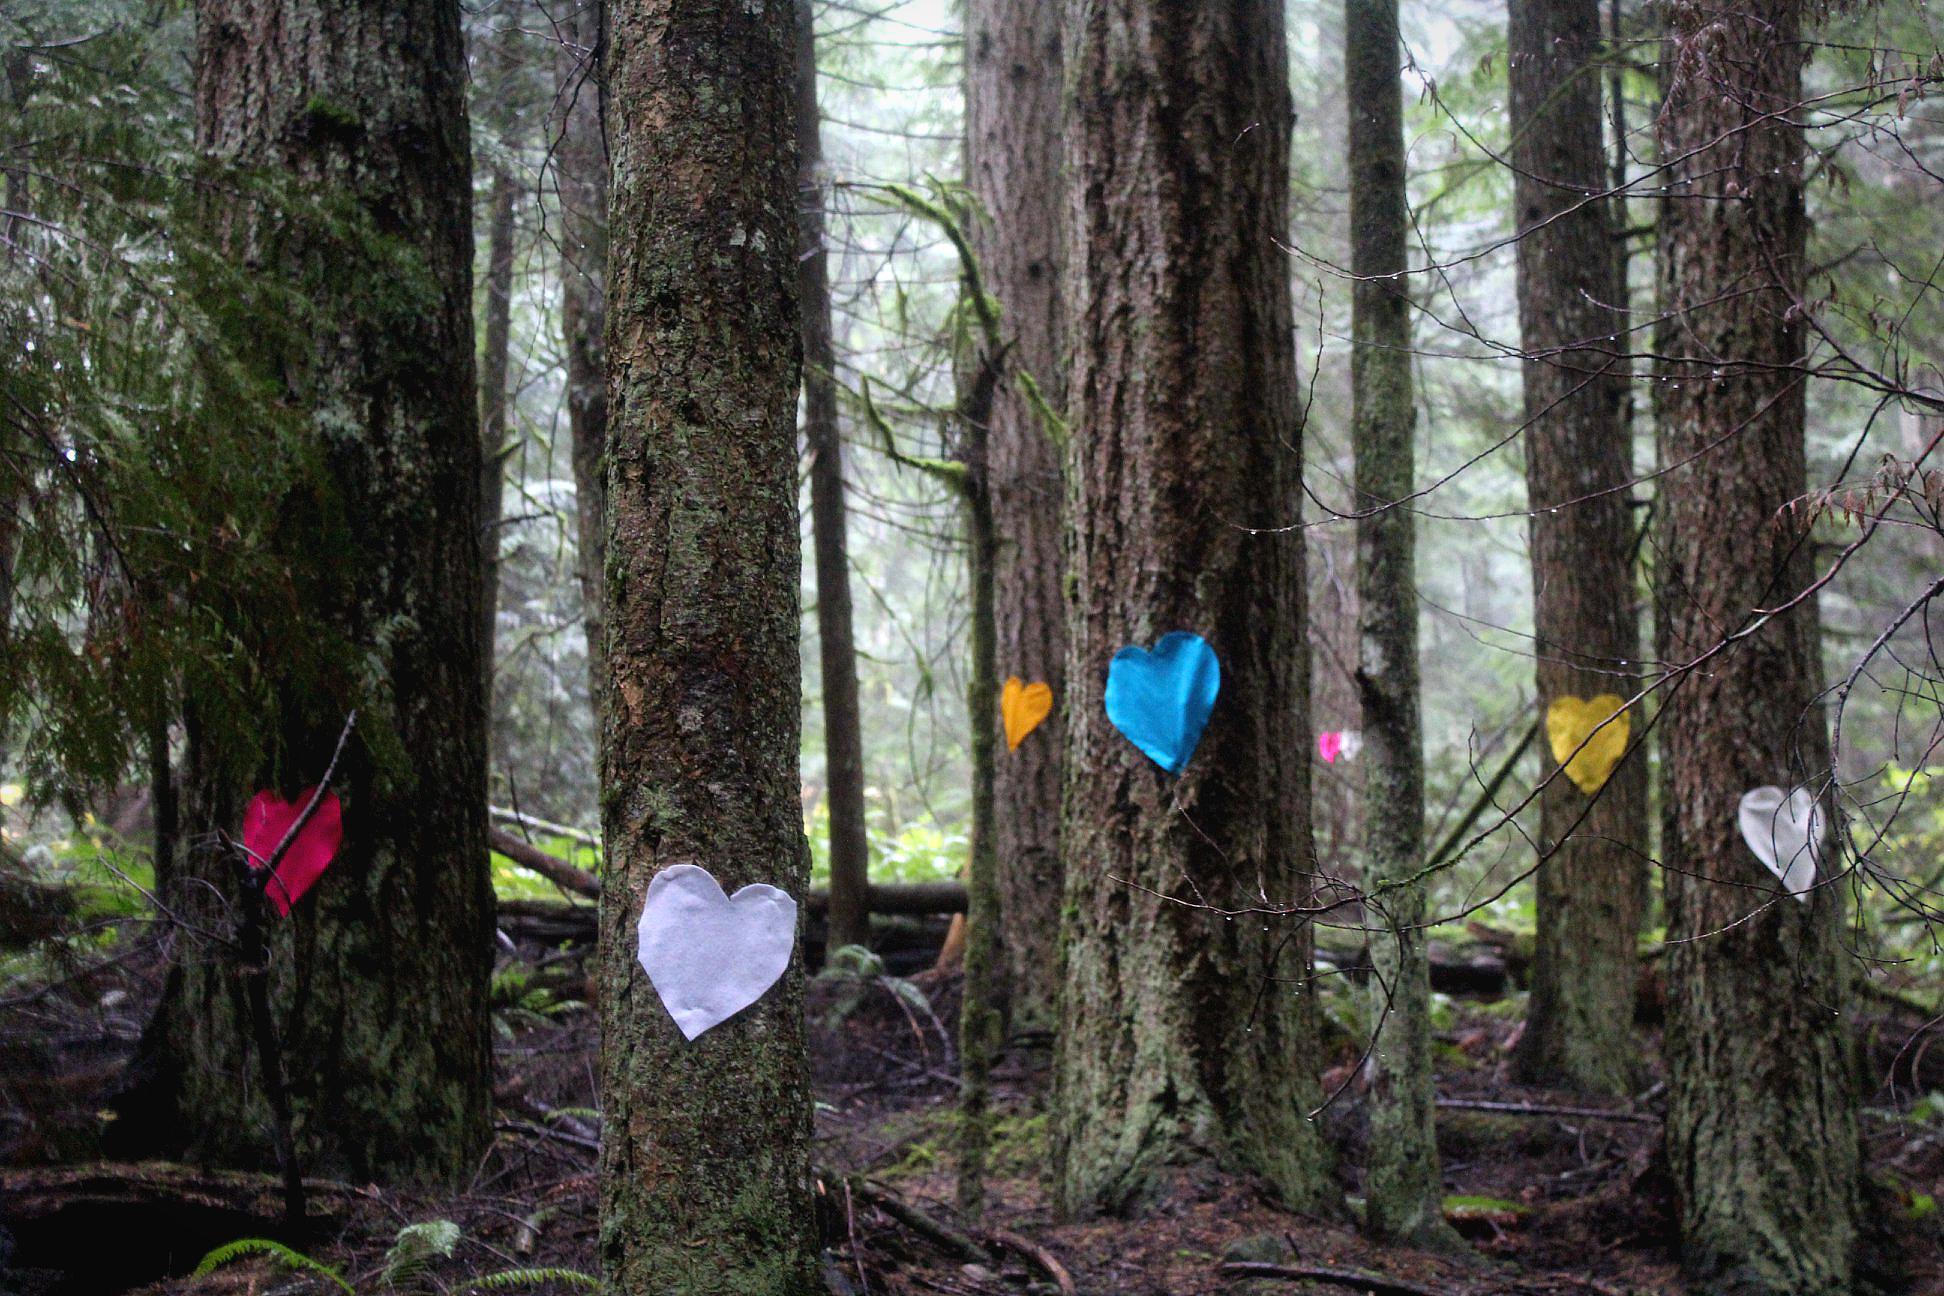 Clack Creek forest felt hearts